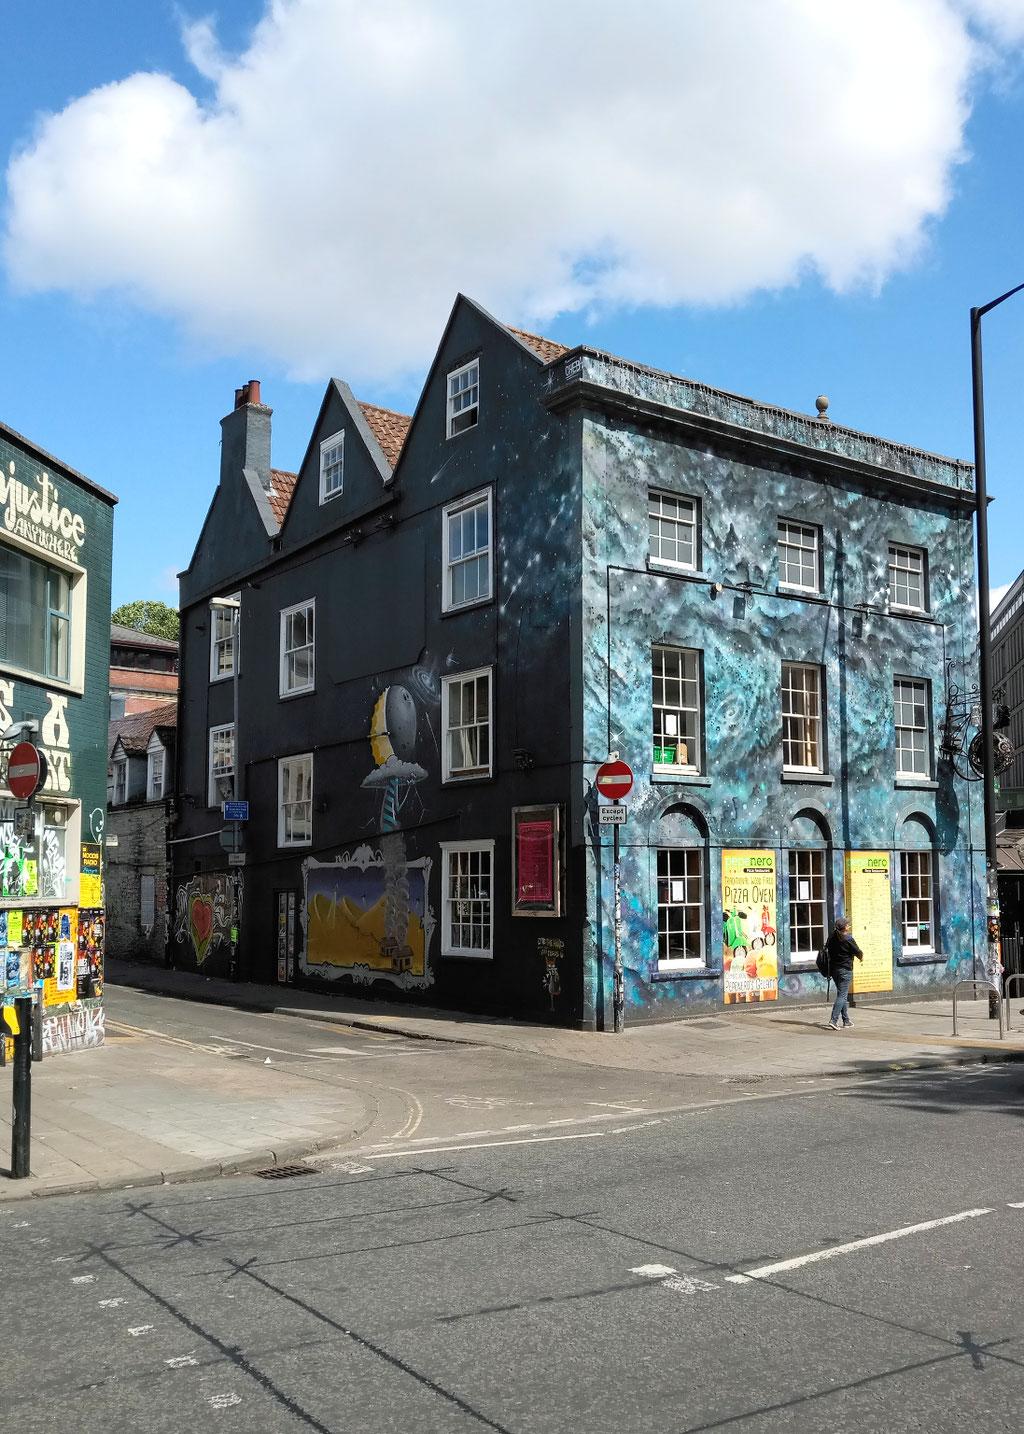 Zum Urlaub nach Cornwall - Bristol Stokes Croft - Zebraspider DIY Anti-Fashion Blog